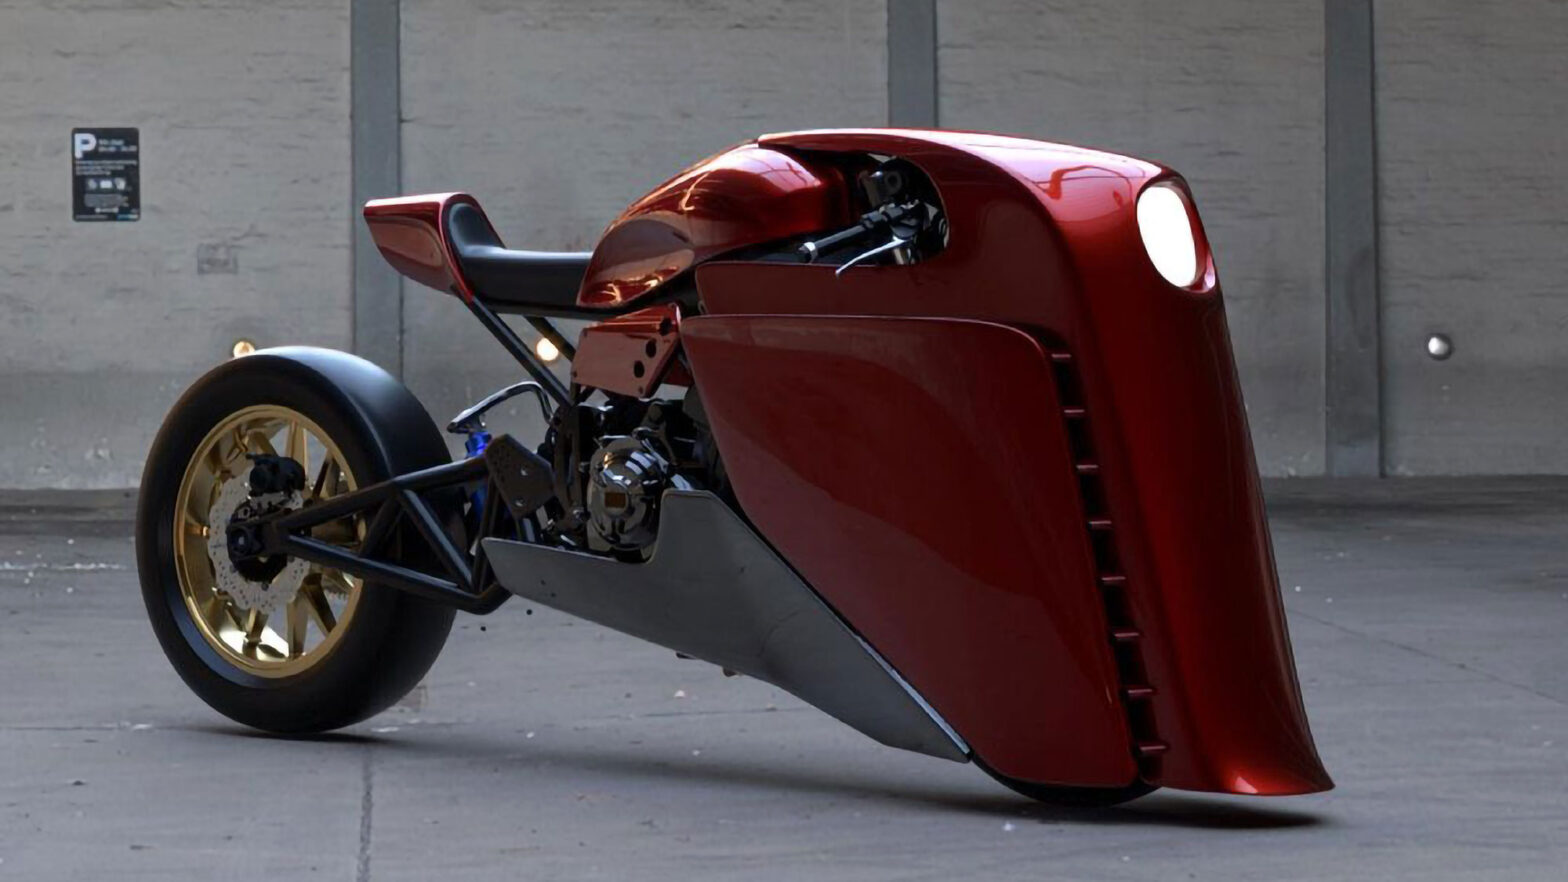 Concept Bike for Anthony Partridge by Ziggymoto